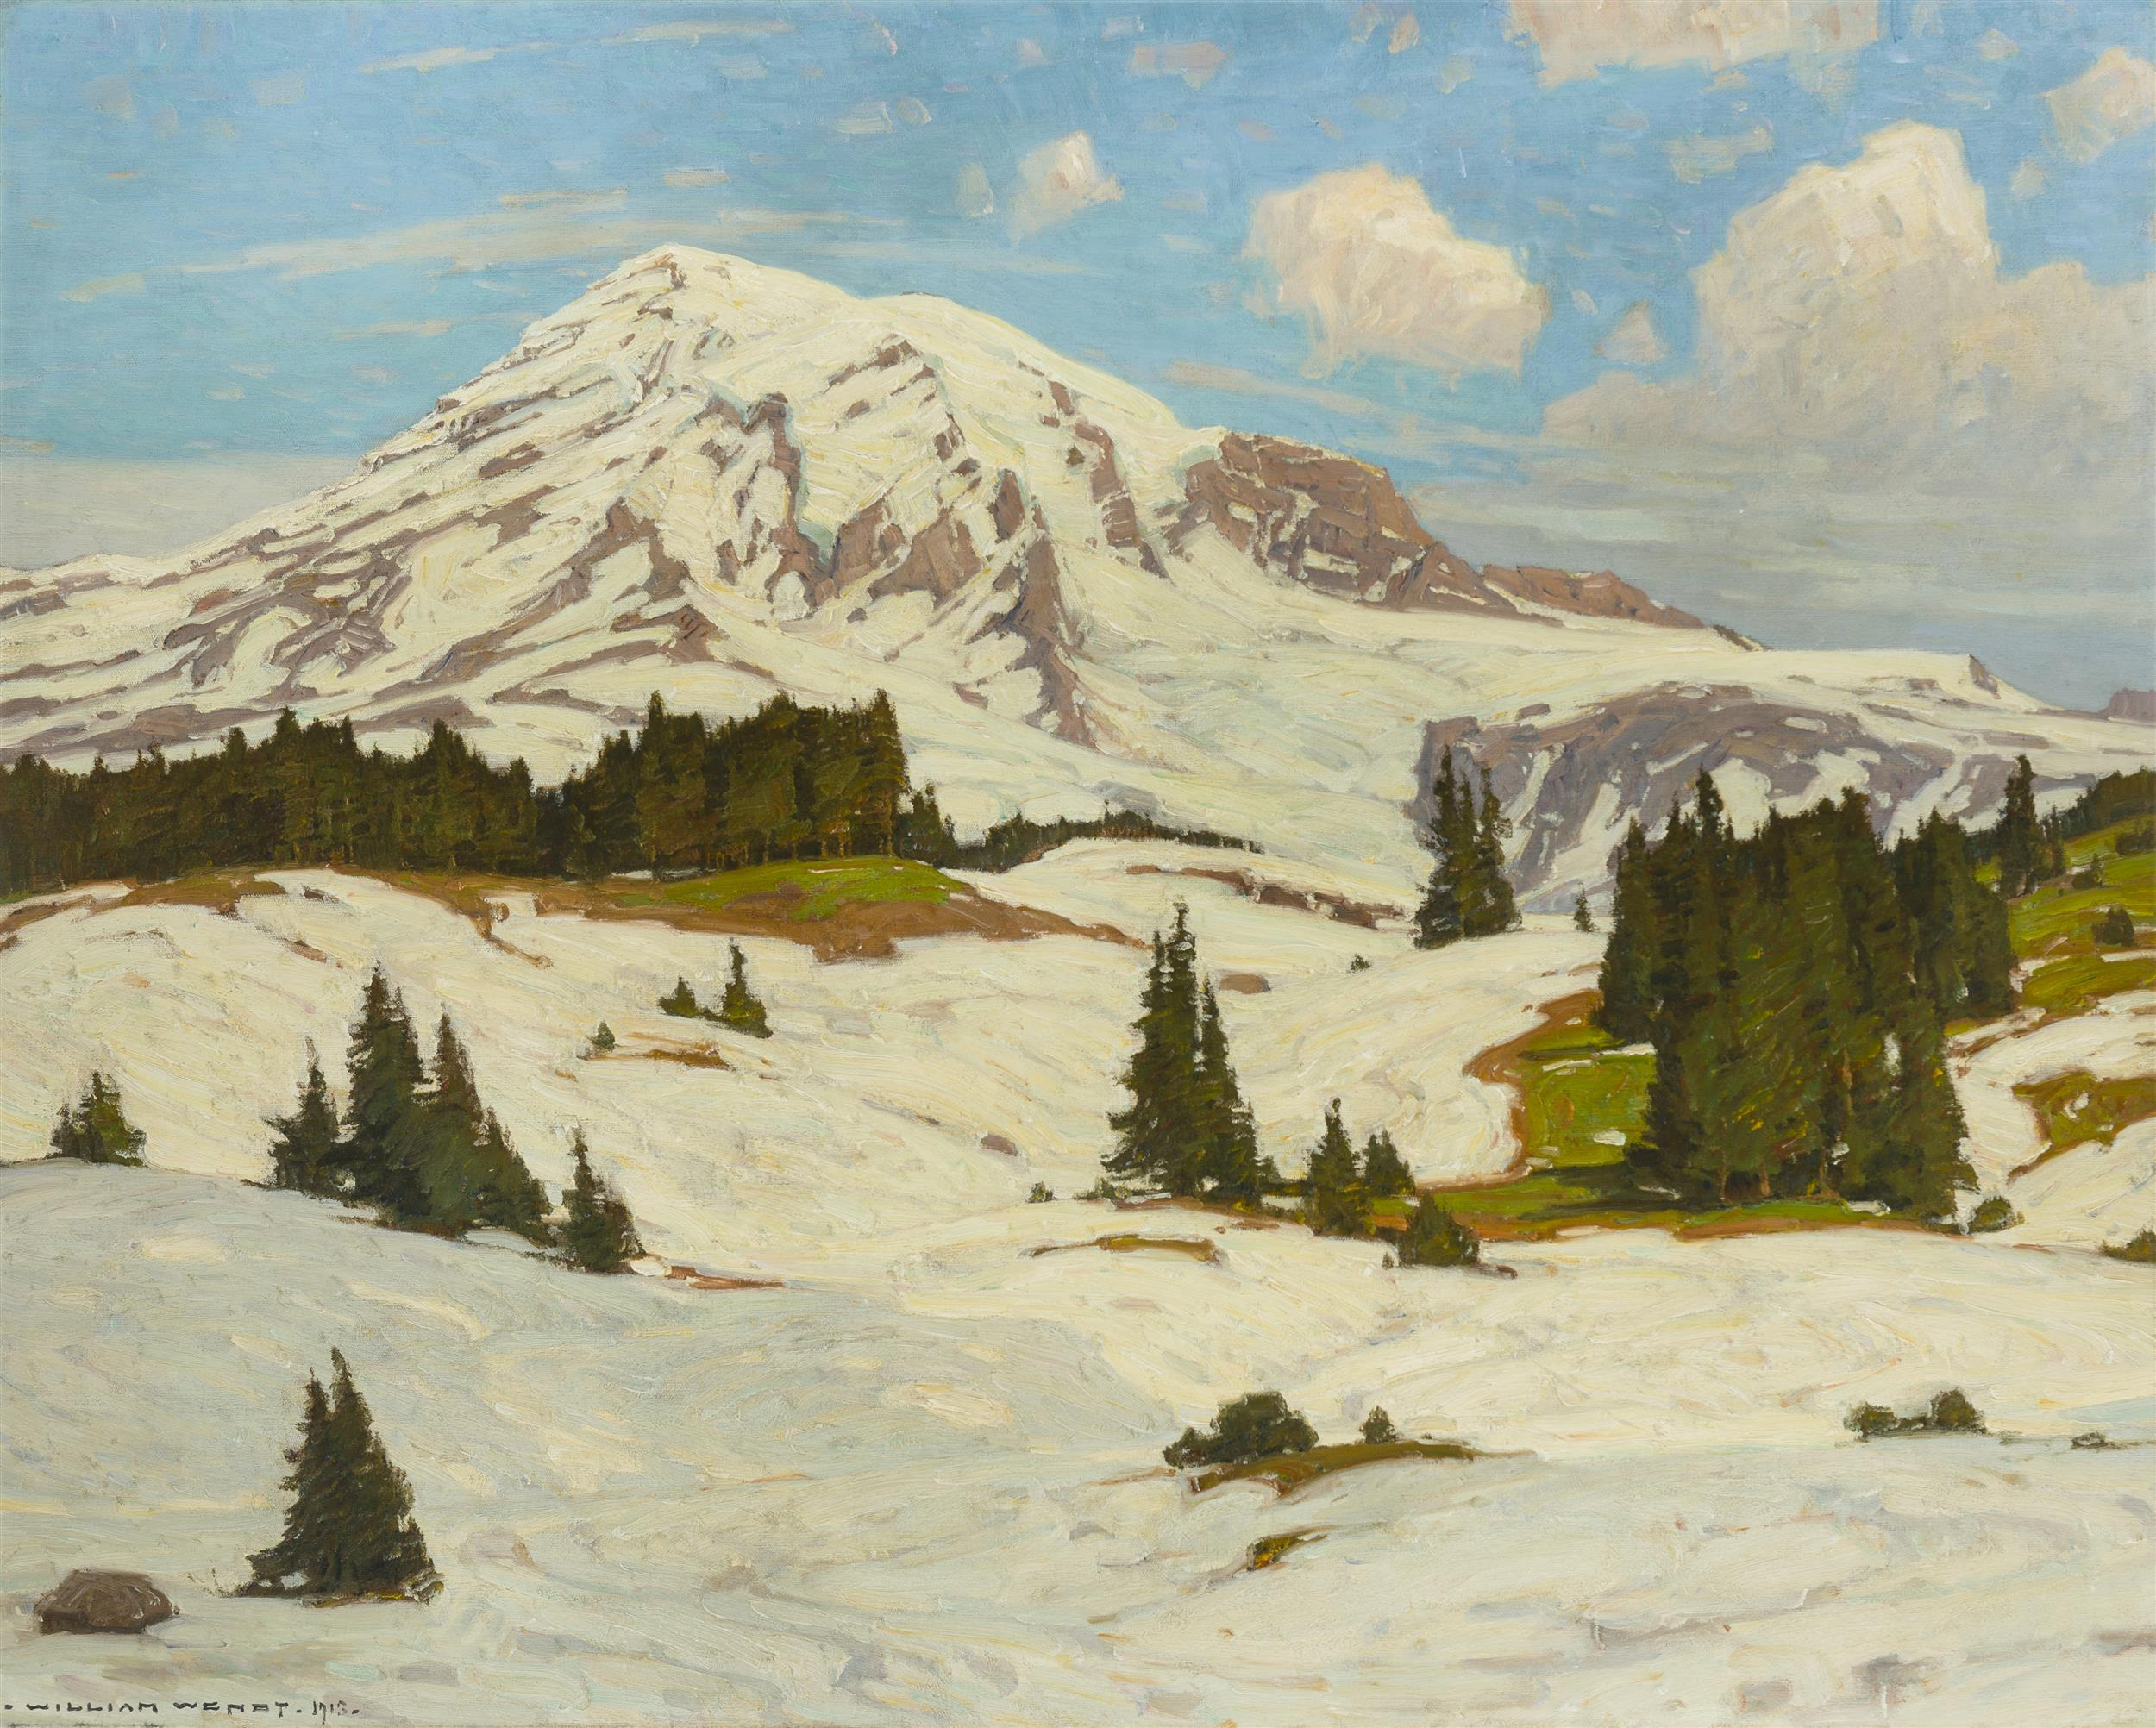 "William Wendt ANA, (1865-1946 Laguna Beach, CA), ""Tahoma, The Eternal,"" 1913, Oil on canvas laid to canvas, 39.75"" H x 49.75"" W"